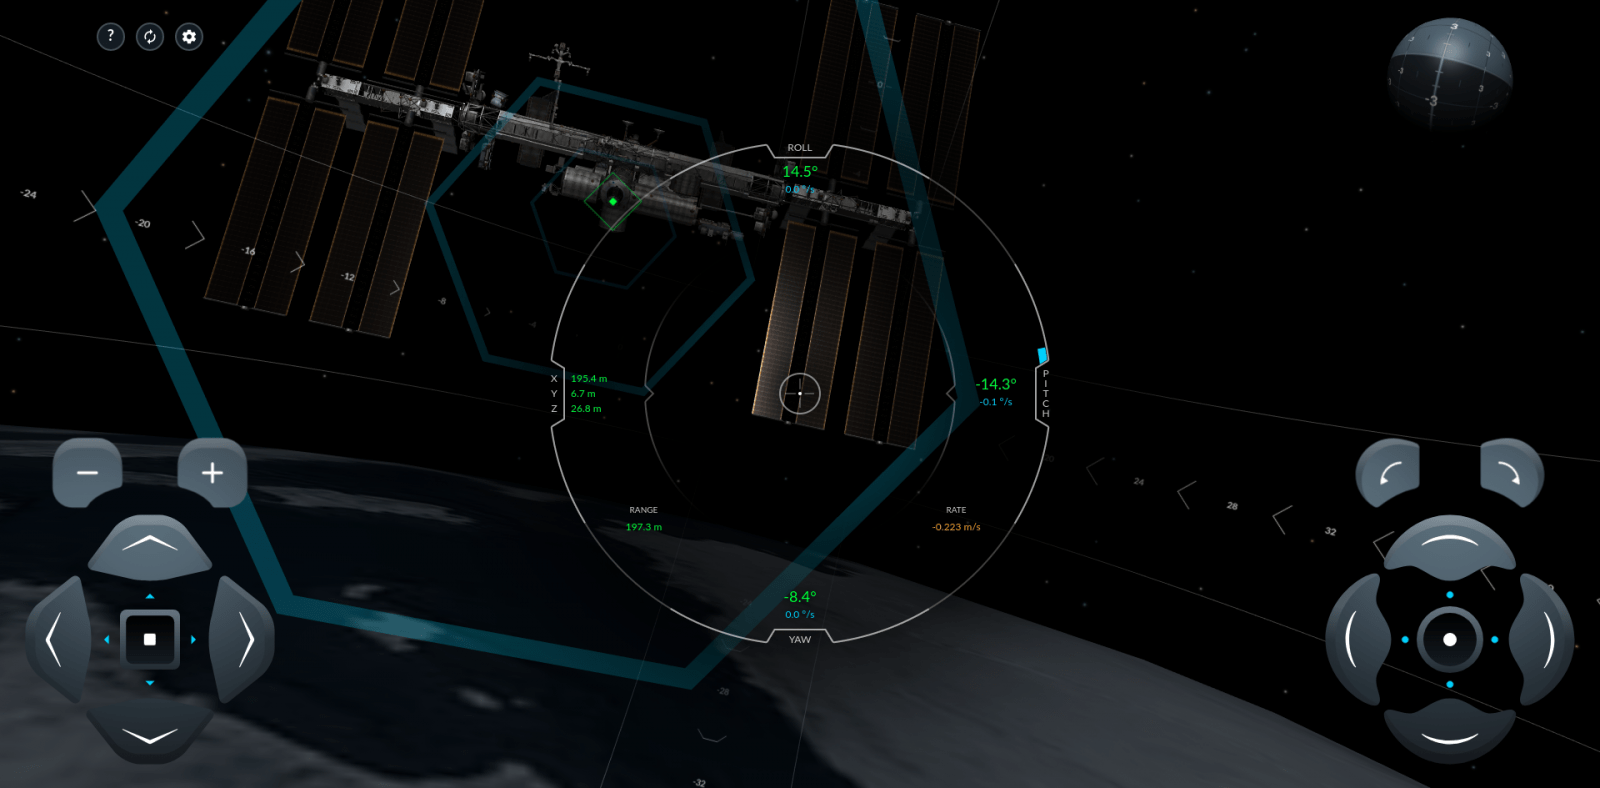 Spacex: миссия компании, особенности и запуски ракет